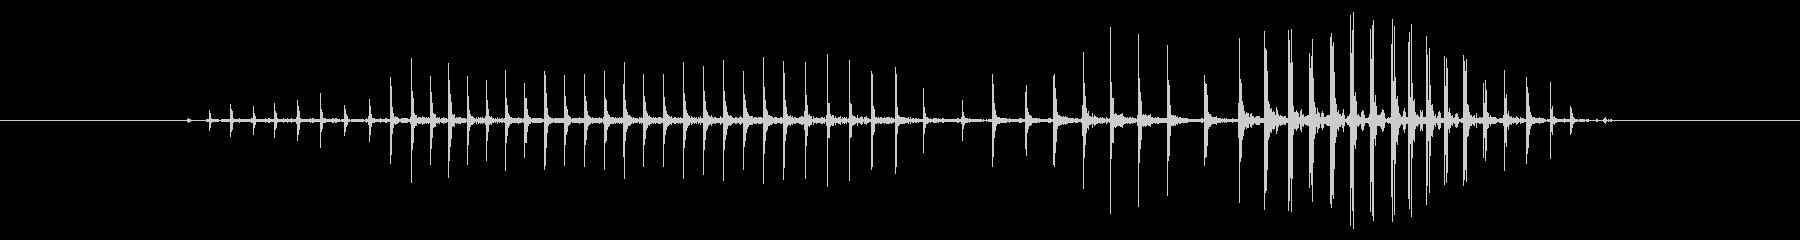 FX おならブライト02の未再生の波形